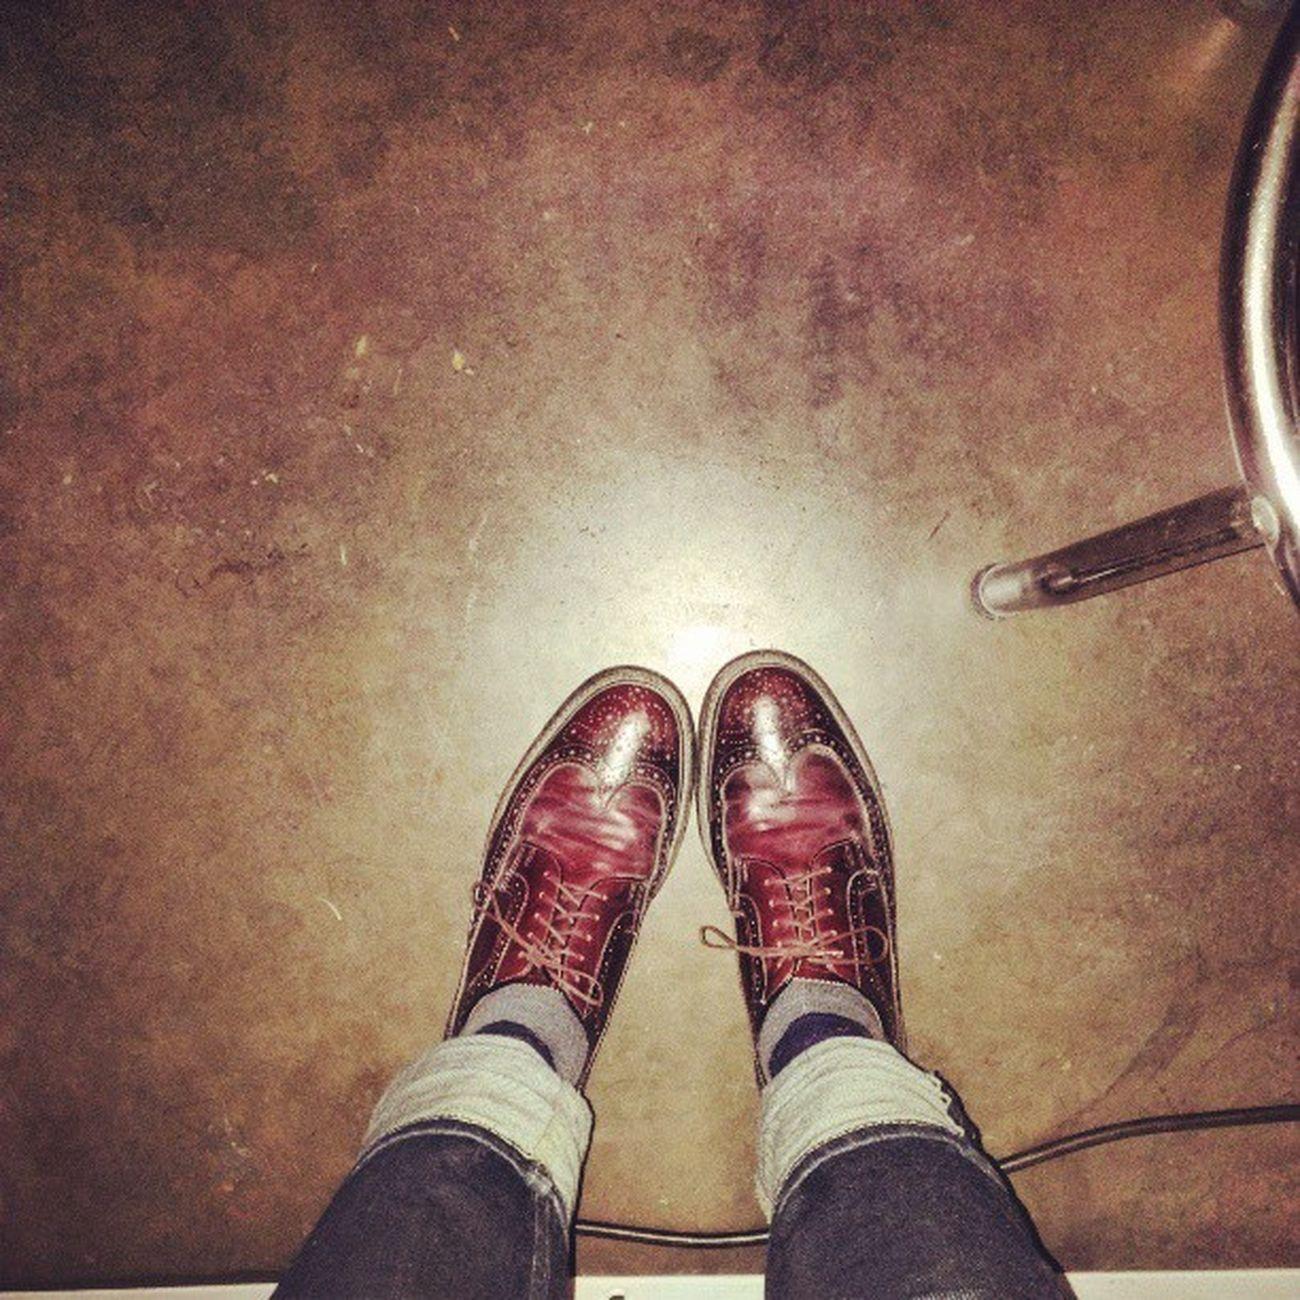 Change of audio nerd Uniform . Traded in my steel toes for Oxblood Wingtips & I'm never going back Tretornsxsw